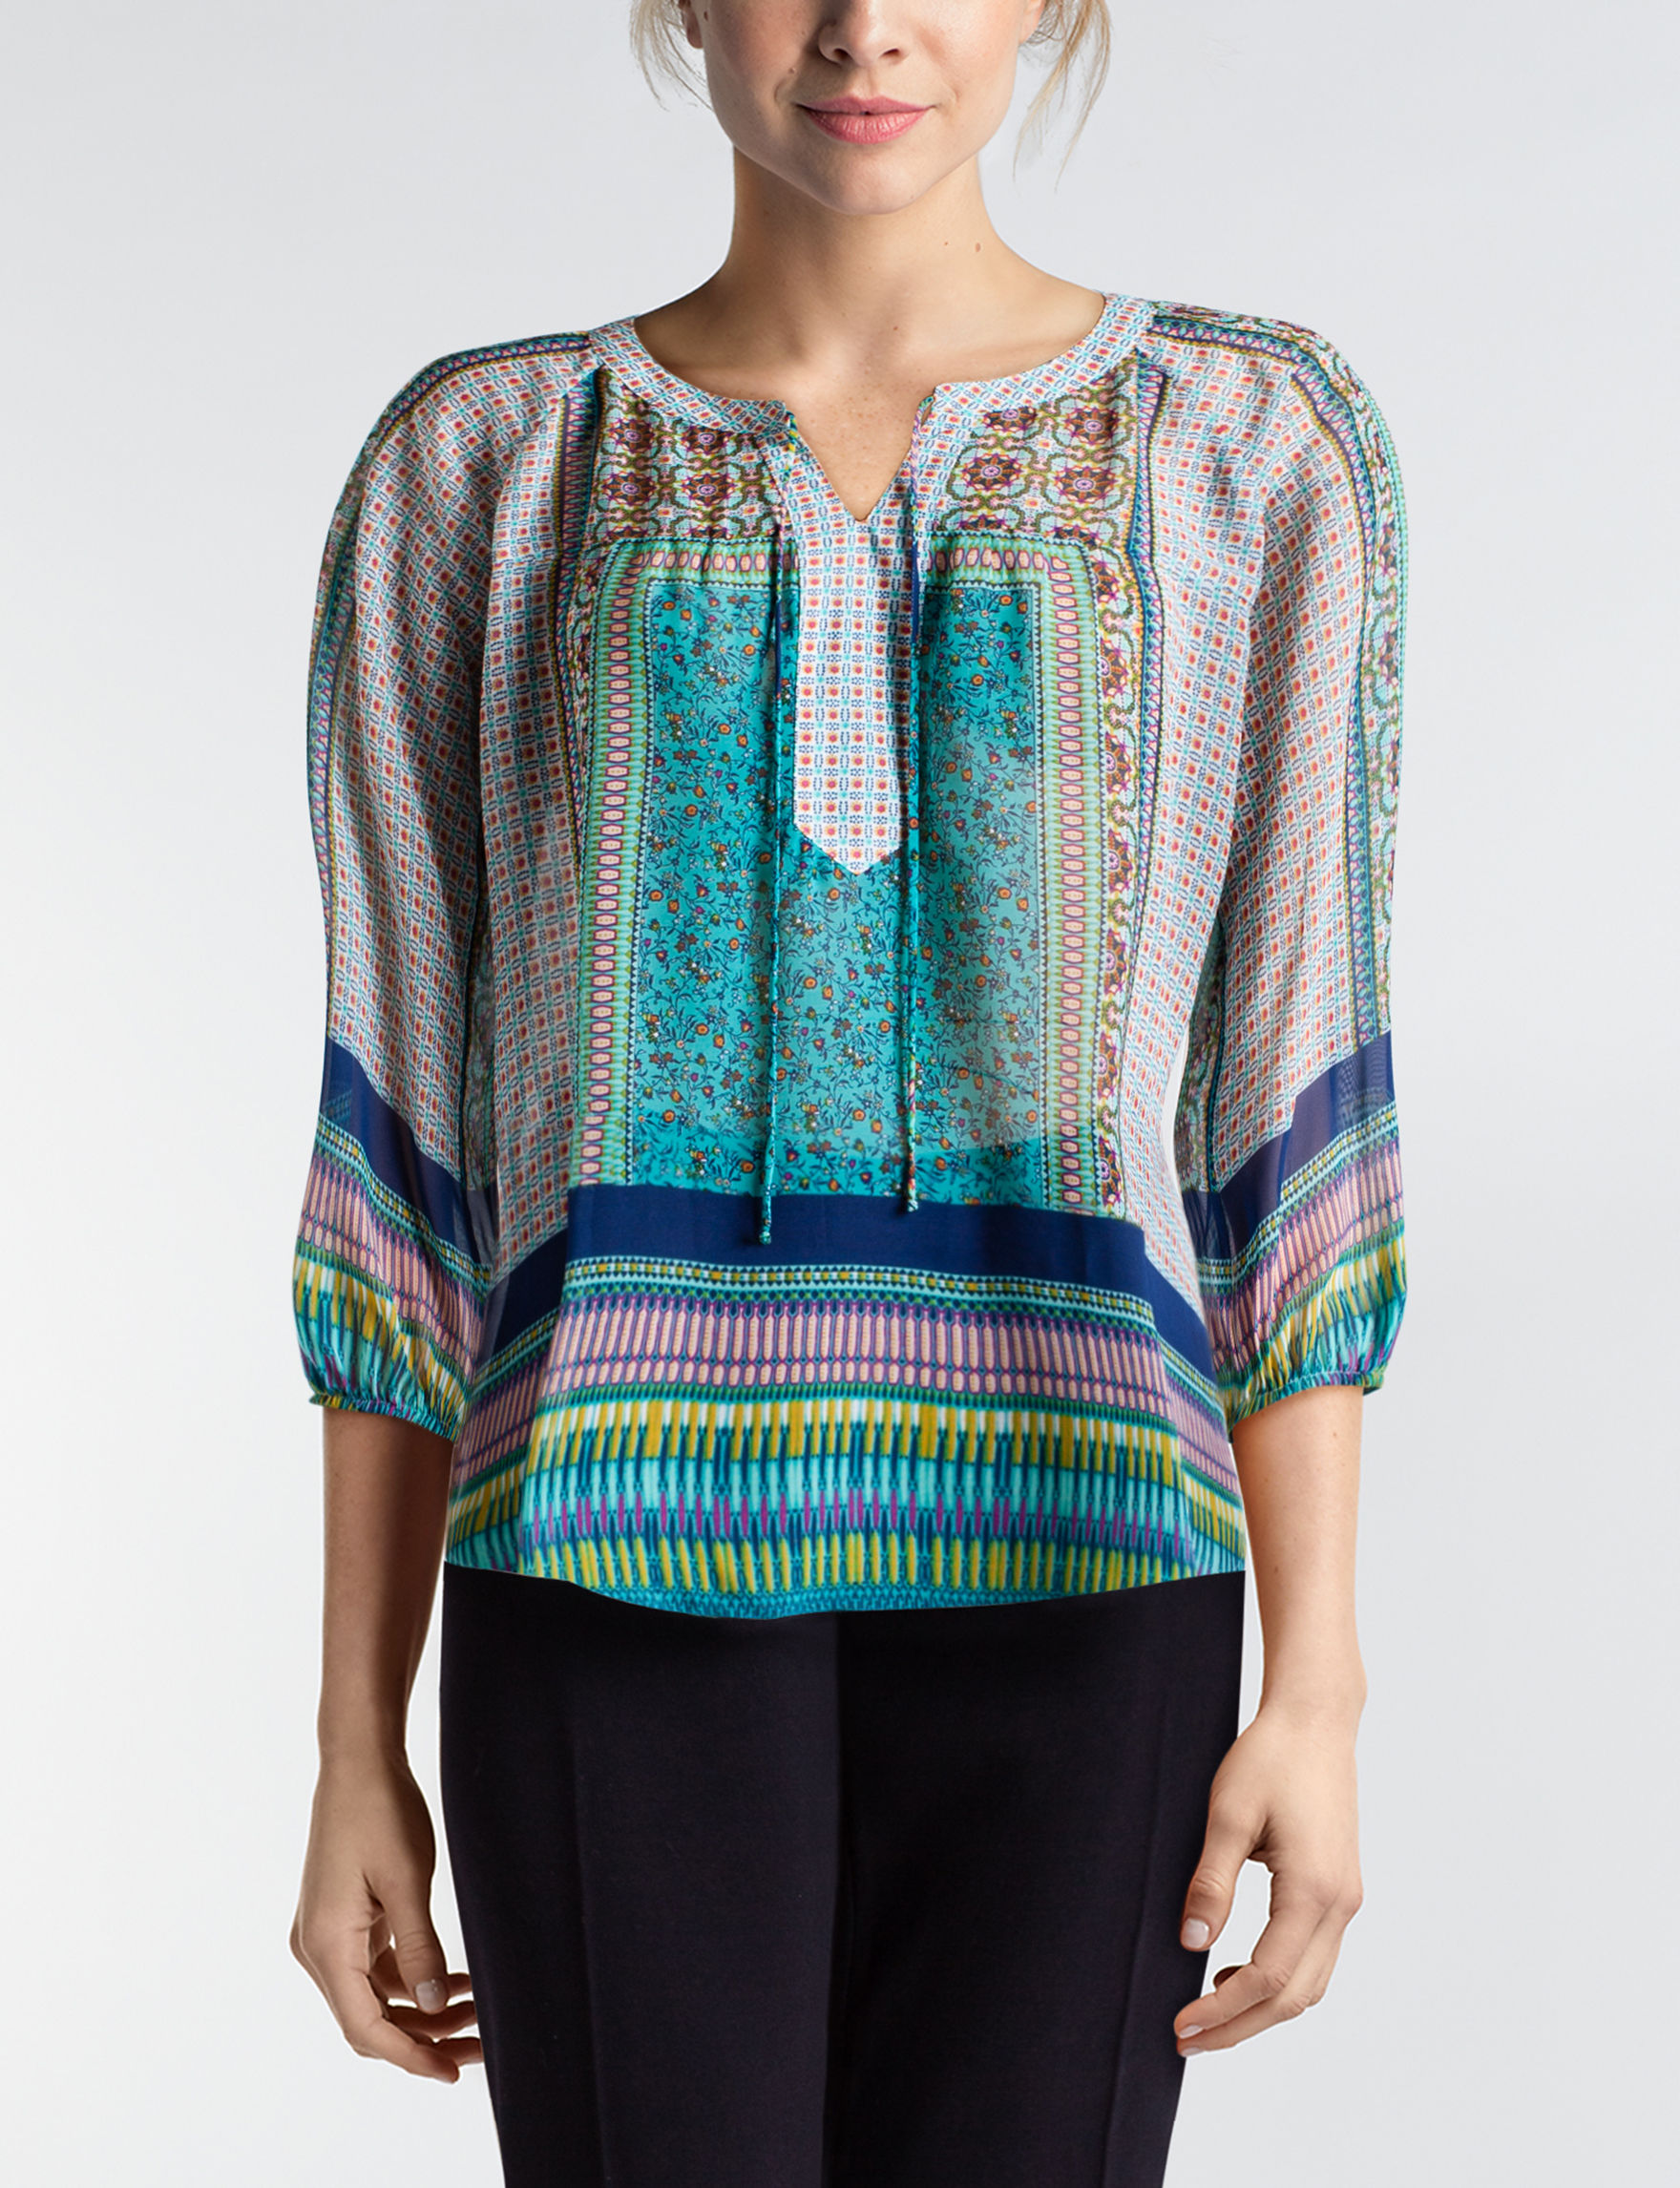 Figuero & Flower Aqua Shirts & Blouses